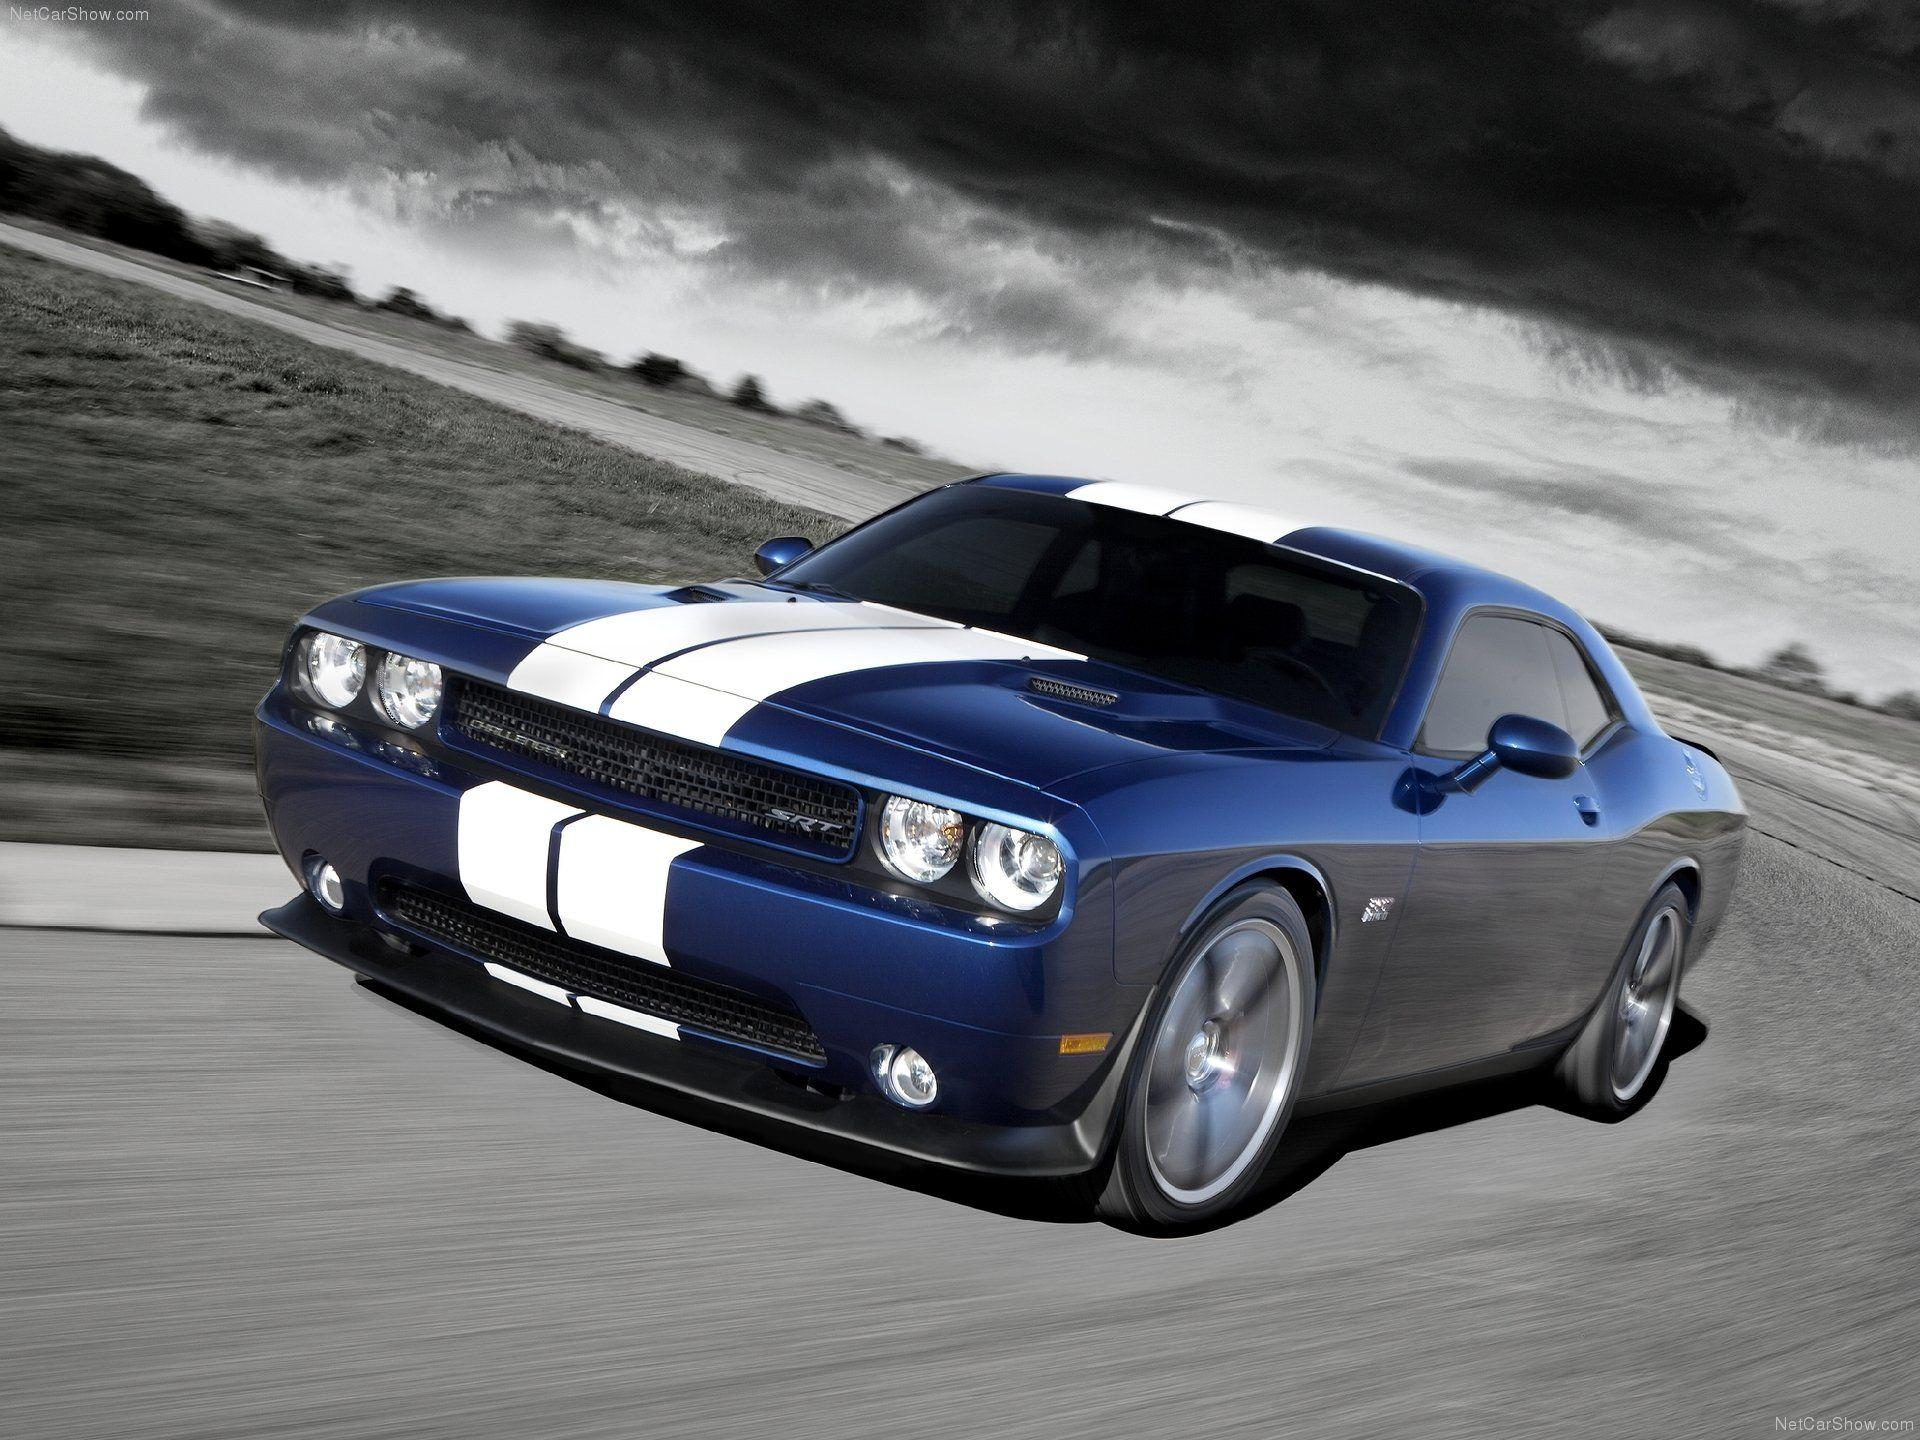 Blue Dodge Charger Srt8 Wallpapers Top Free Blue Dodge